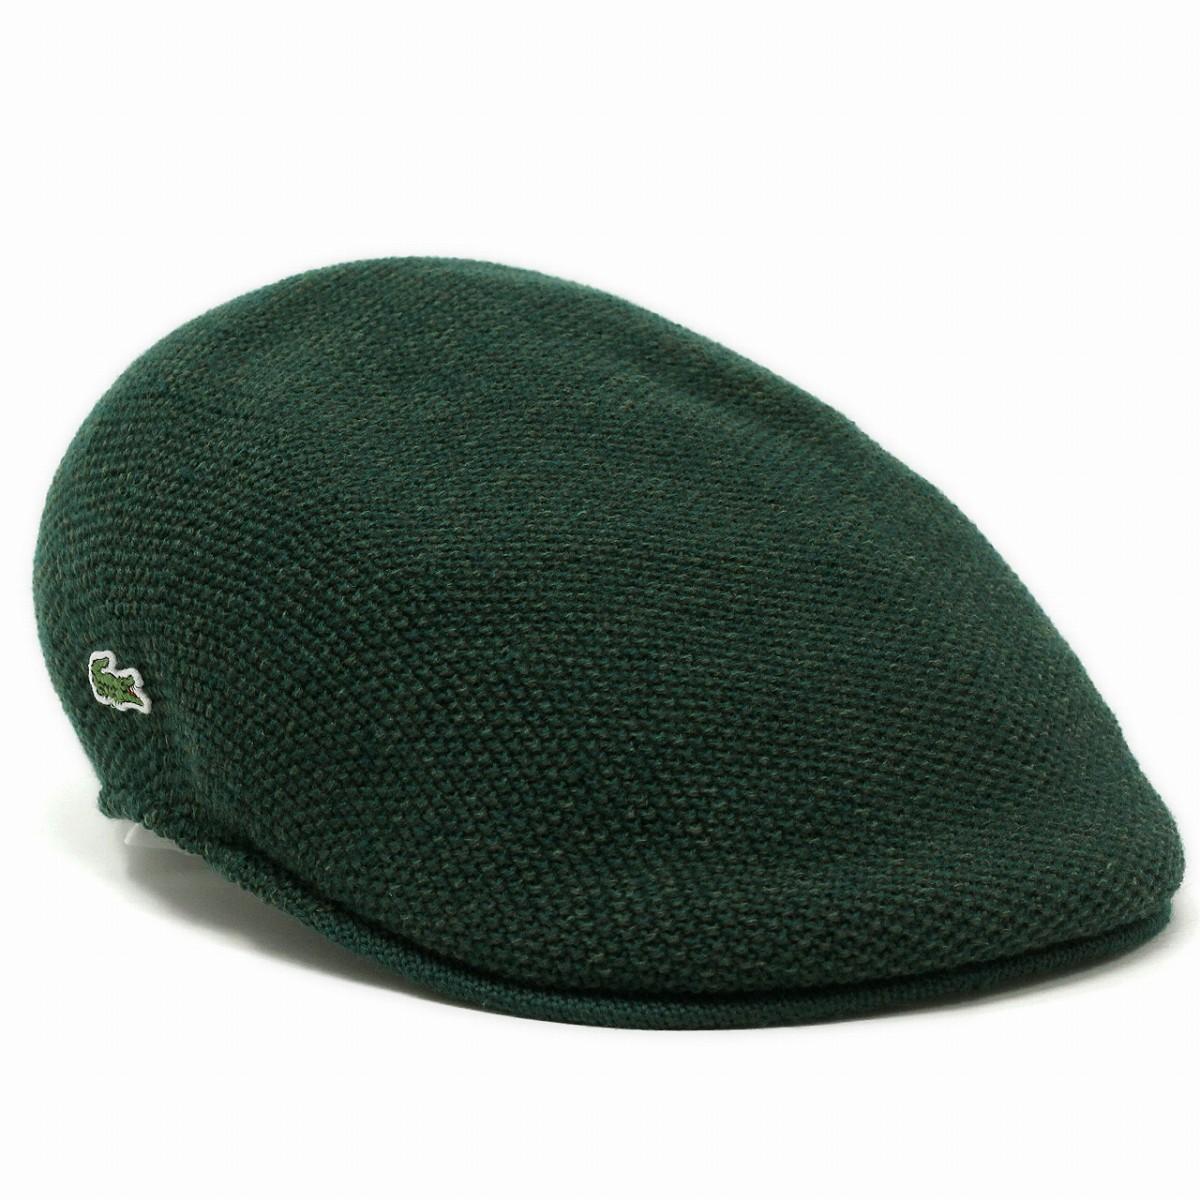 0908096c939 Hunting Hat mens LACOSTE hunting ladies Lacoste fall winter lacoste Hunting  Hat men s knit hat LACOSTE cap thurmont Regal Al size adjustable fashion ...